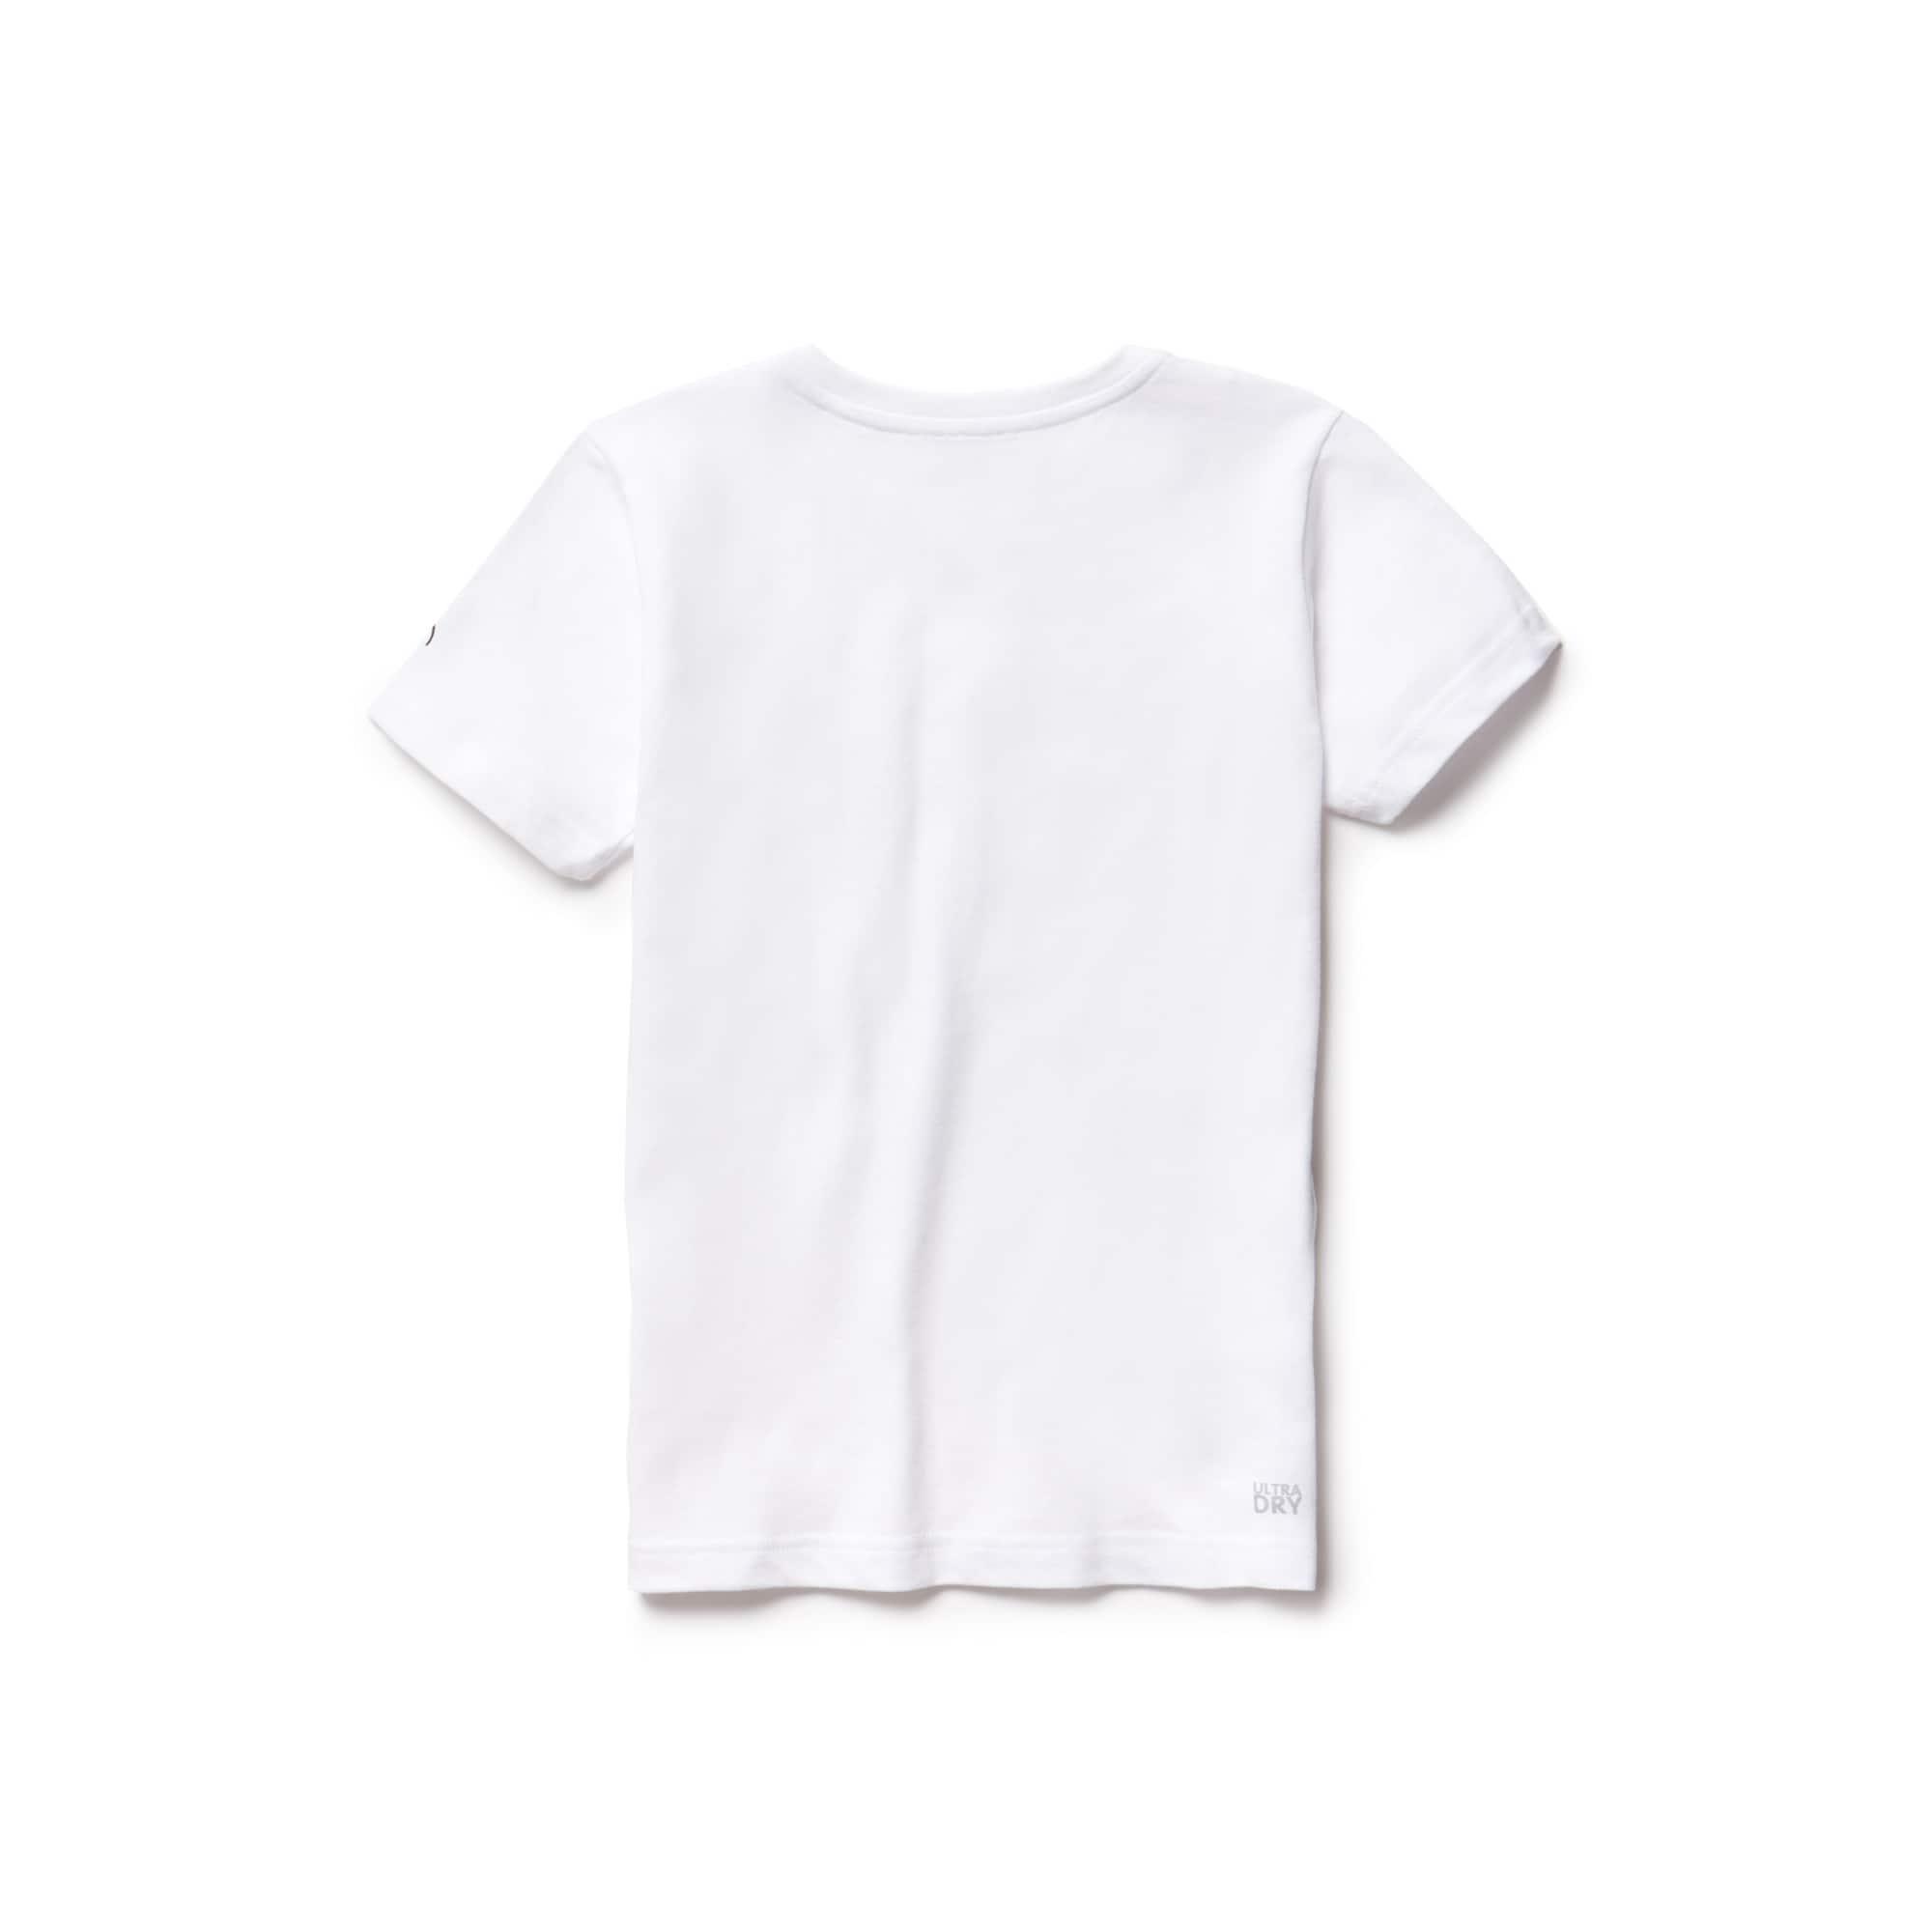 Lacoste - Camiseta De Niño Lacoste SPORT Novak Djokovic Support With Style -Off Court Collection En Tejido De Punto Técnico Estampado - 2